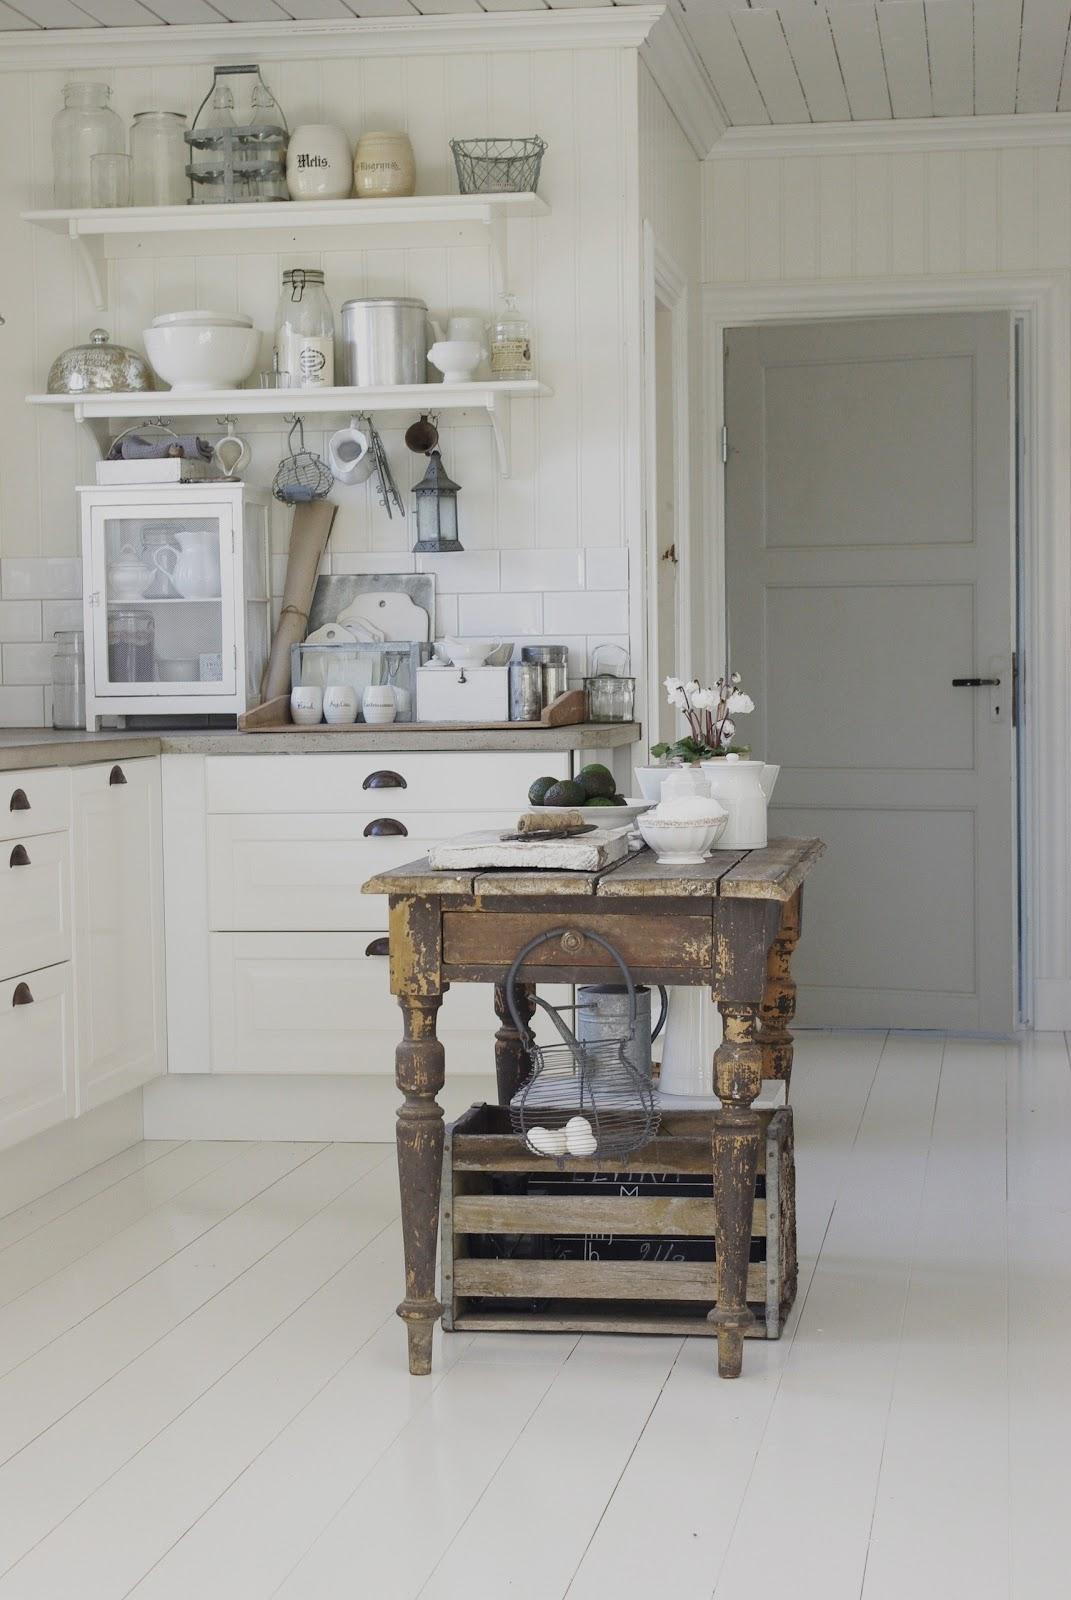 Vintage Keukeneiland: Bordet ?r gammalt o fyndat hos en.